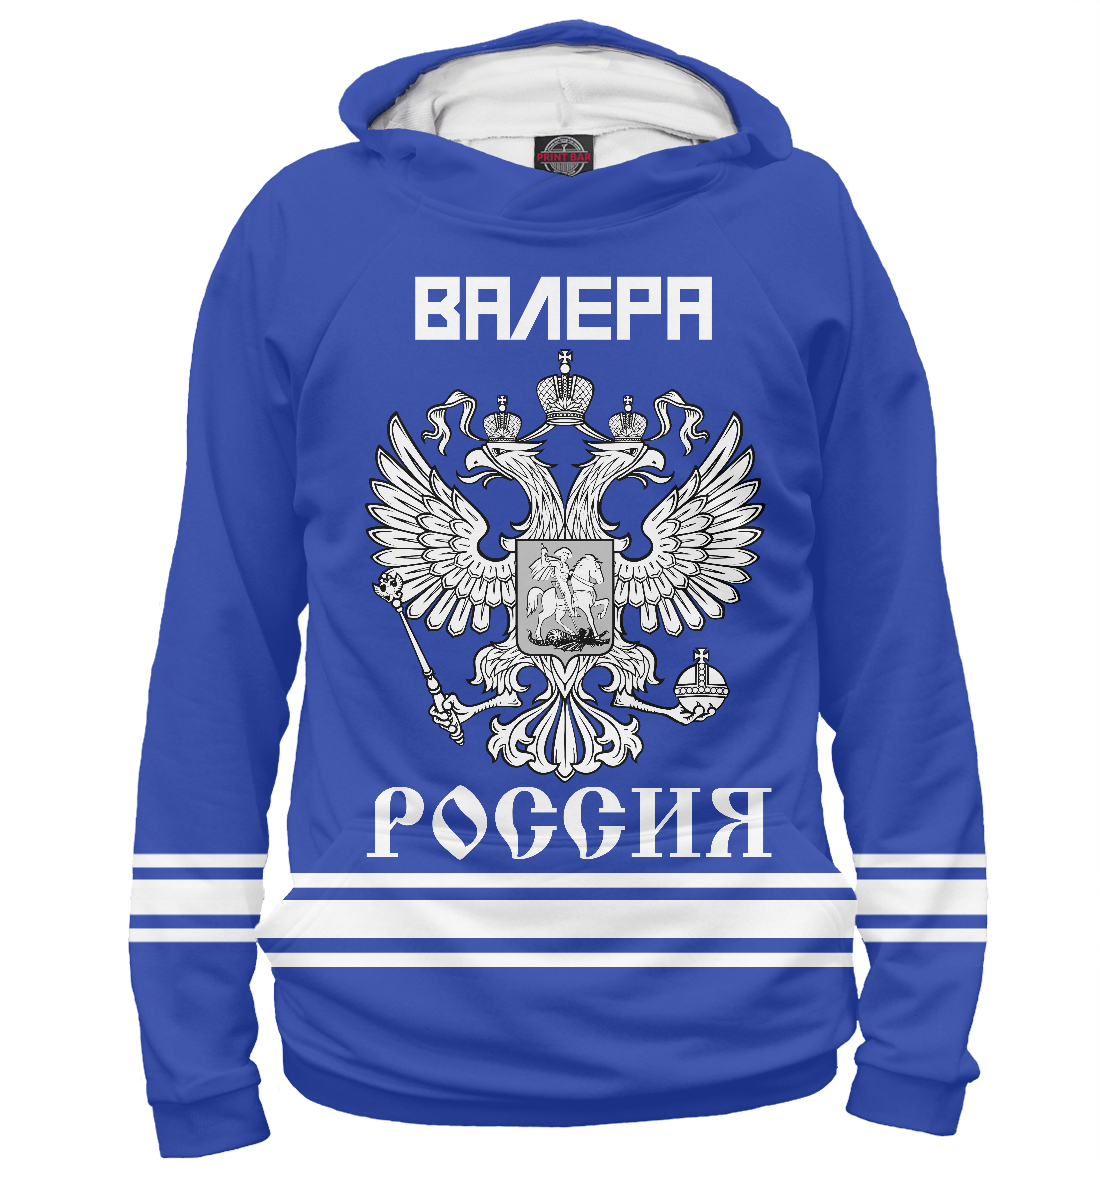 Купить ВАЛЕРА sport russia collection, Printbar, Худи, VLR-458019-hud-1